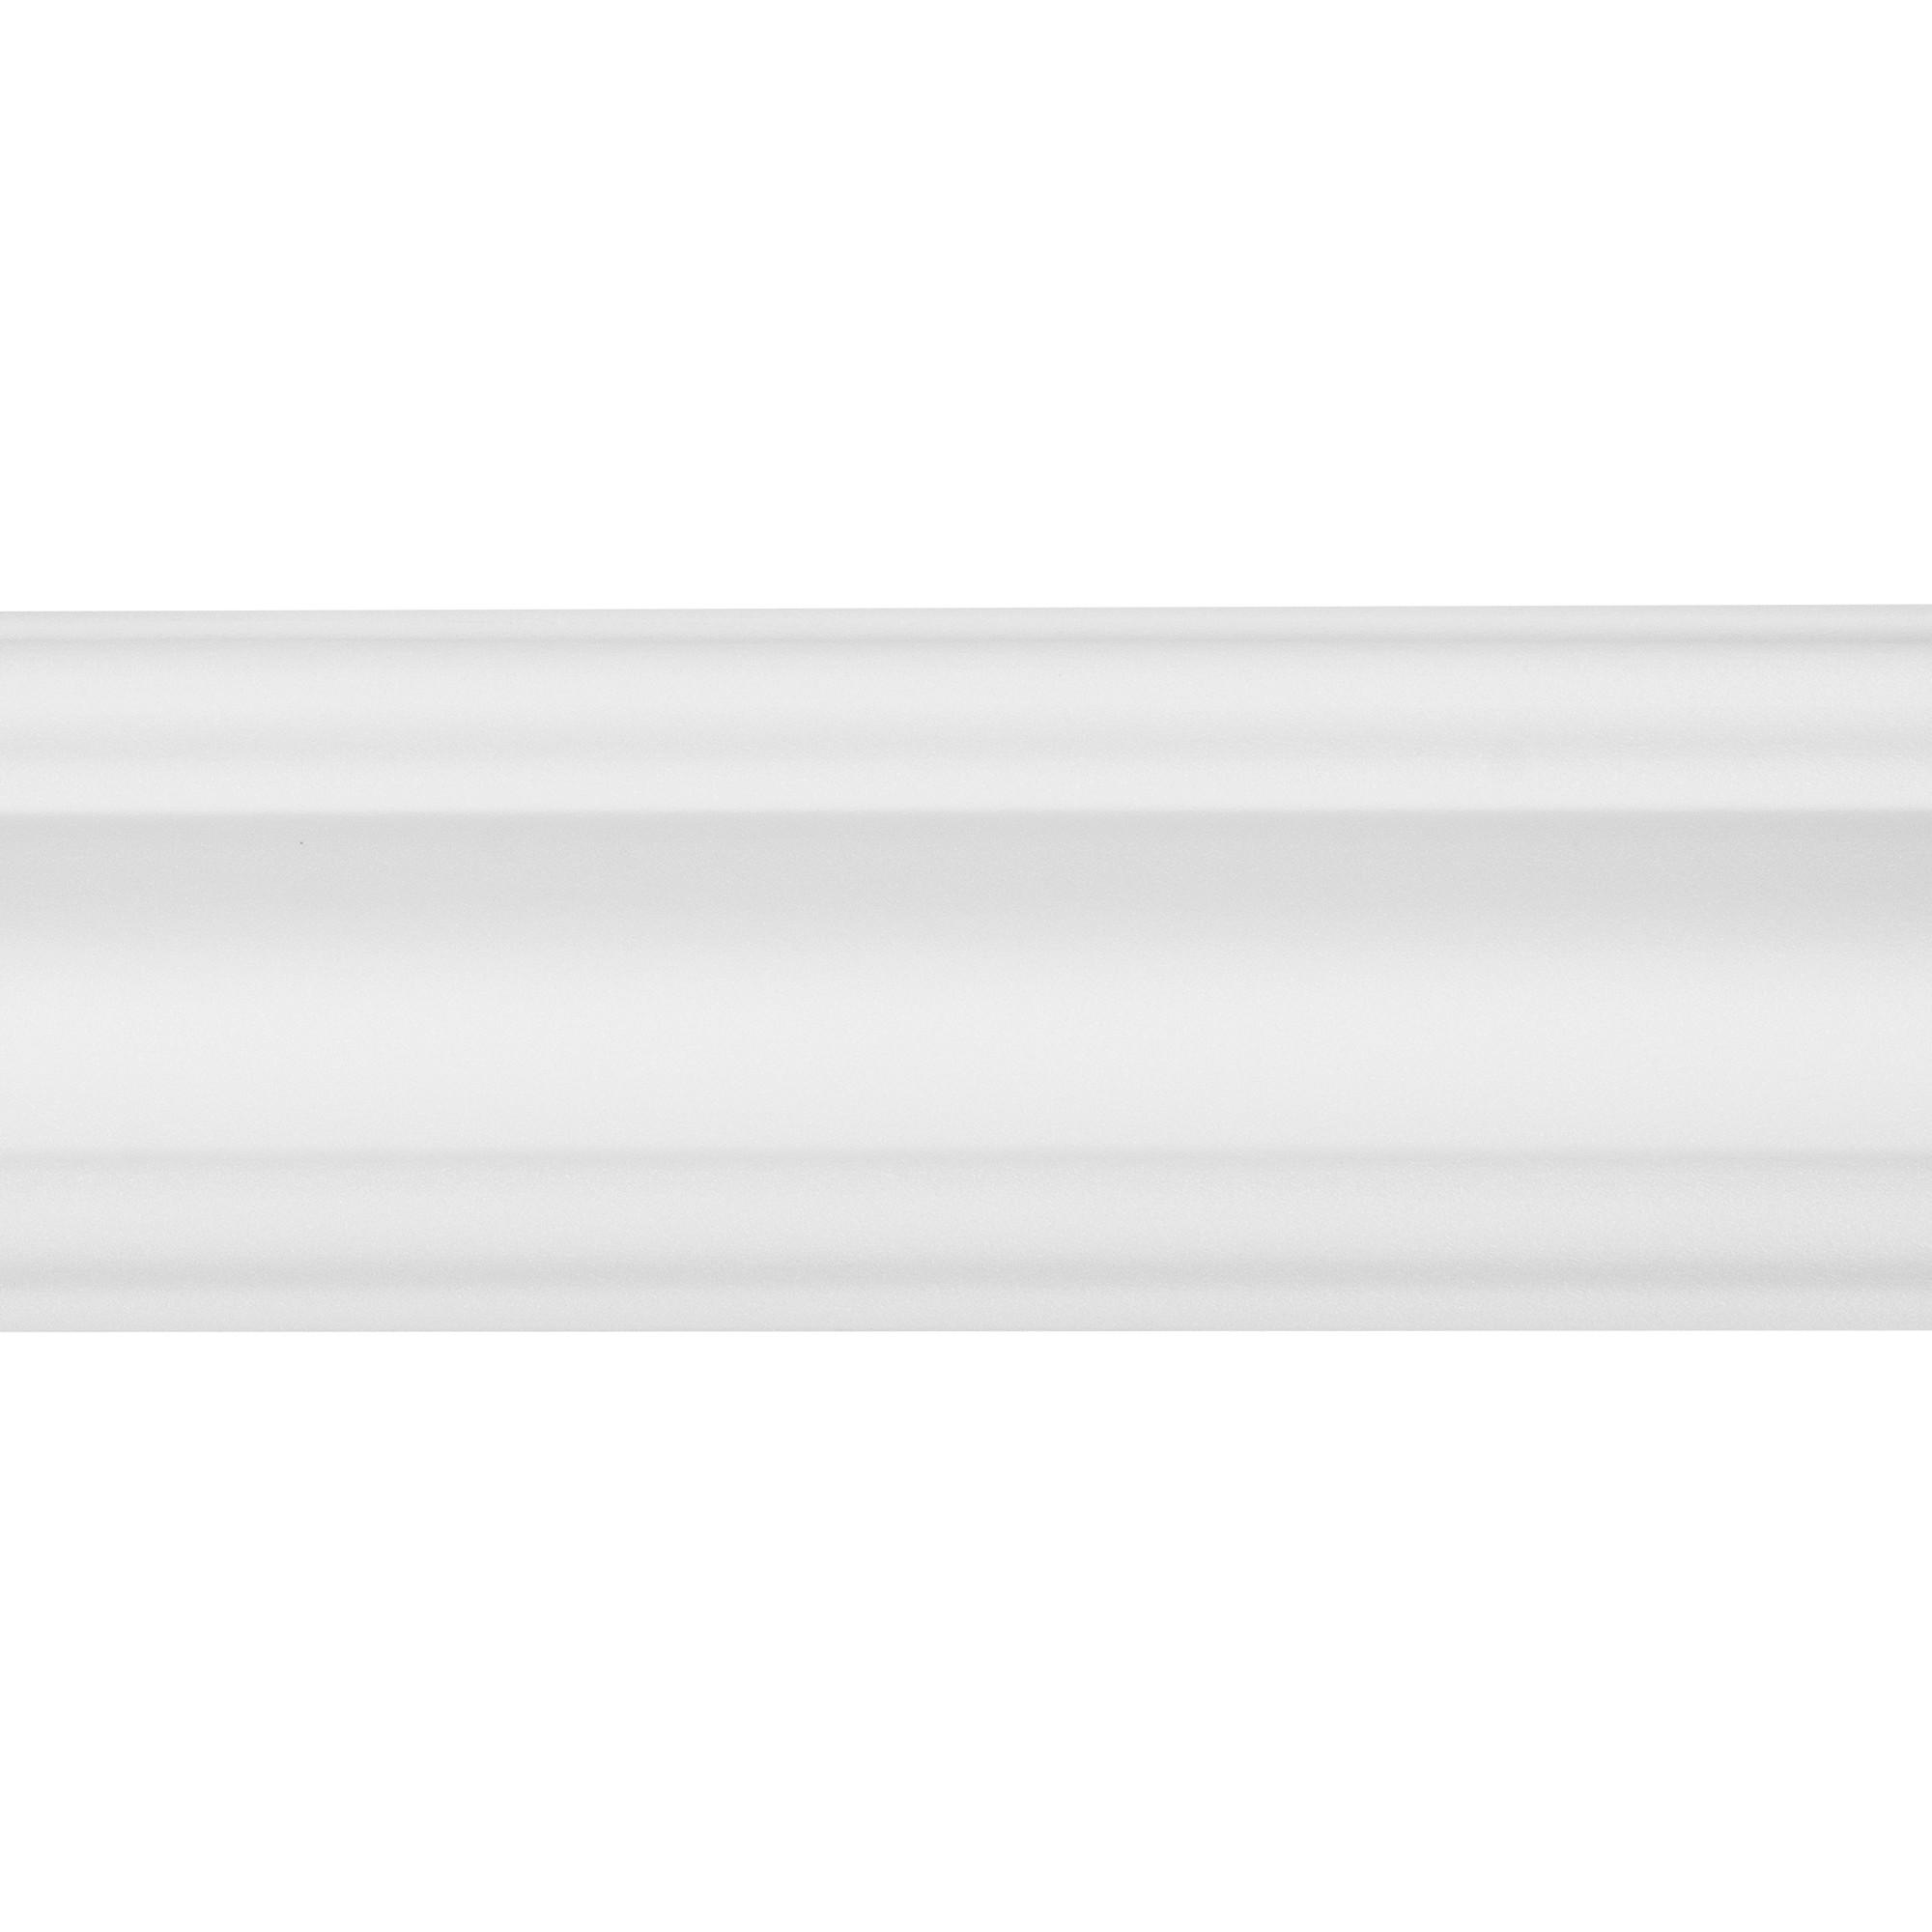 Плинтус потолочный Inspire 07006А 200х7 см цвет белый